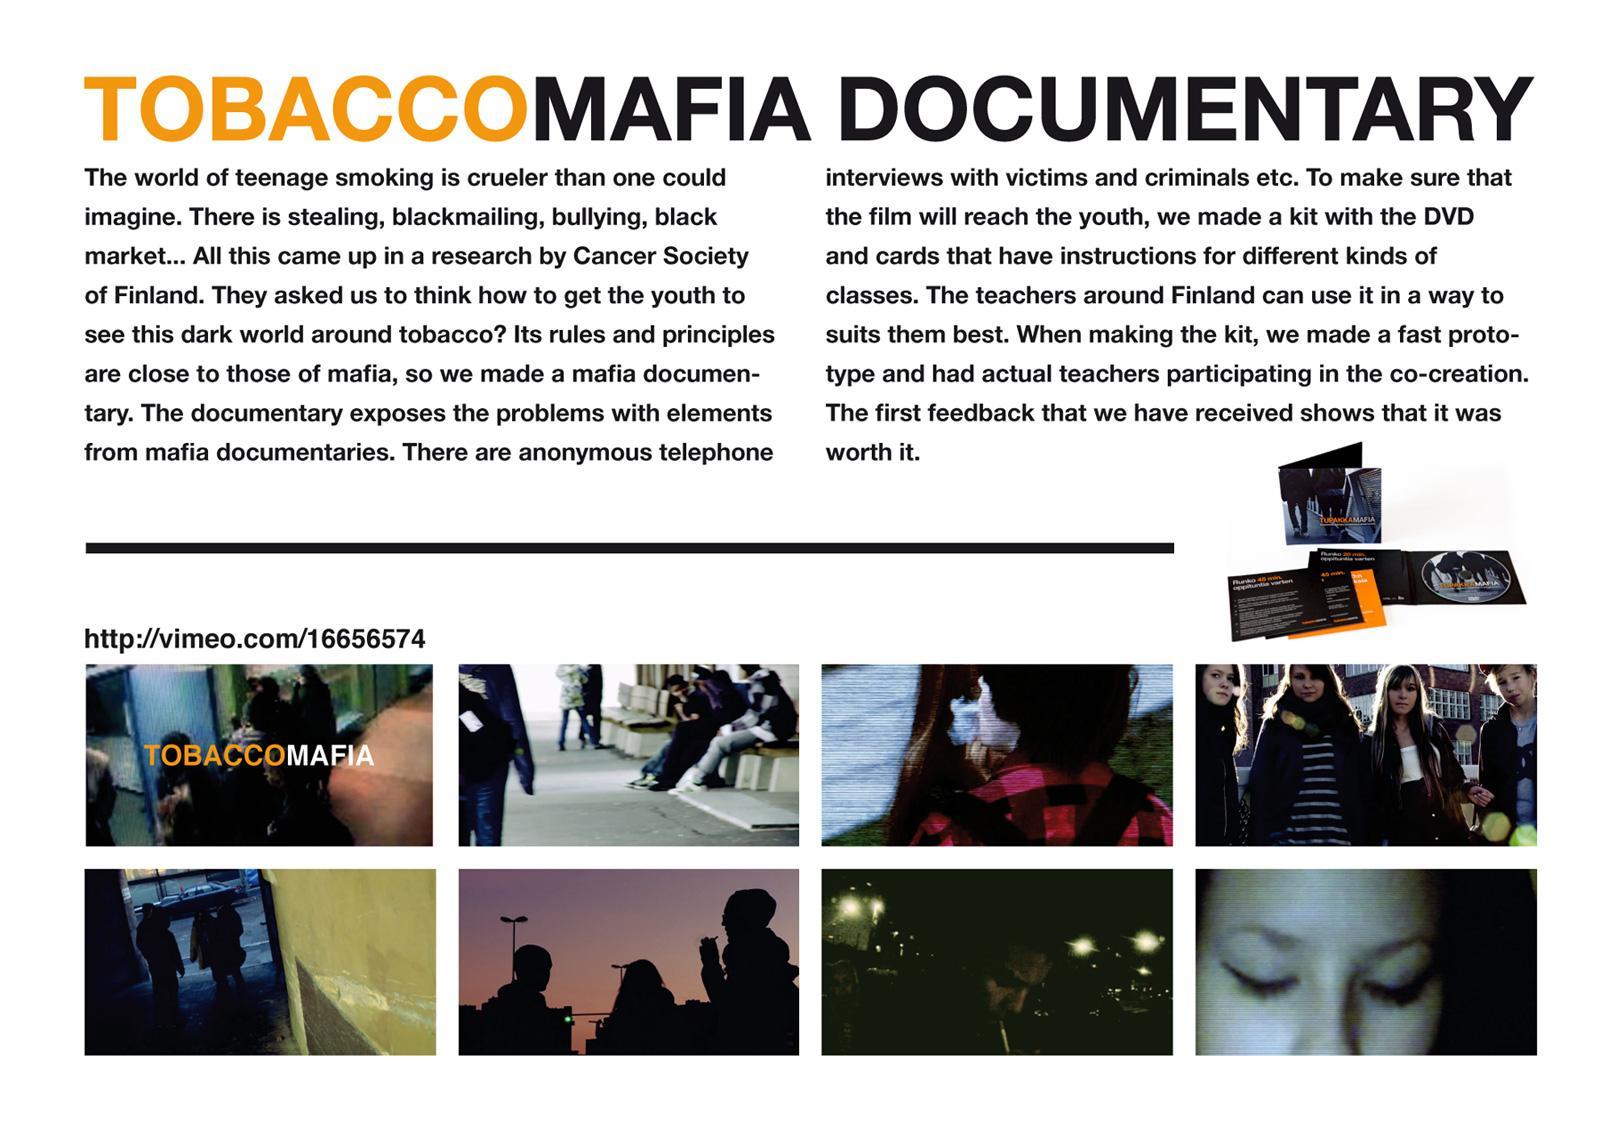 Cancer Society of Finland Film Ad -  Tobaccomafia Documentary